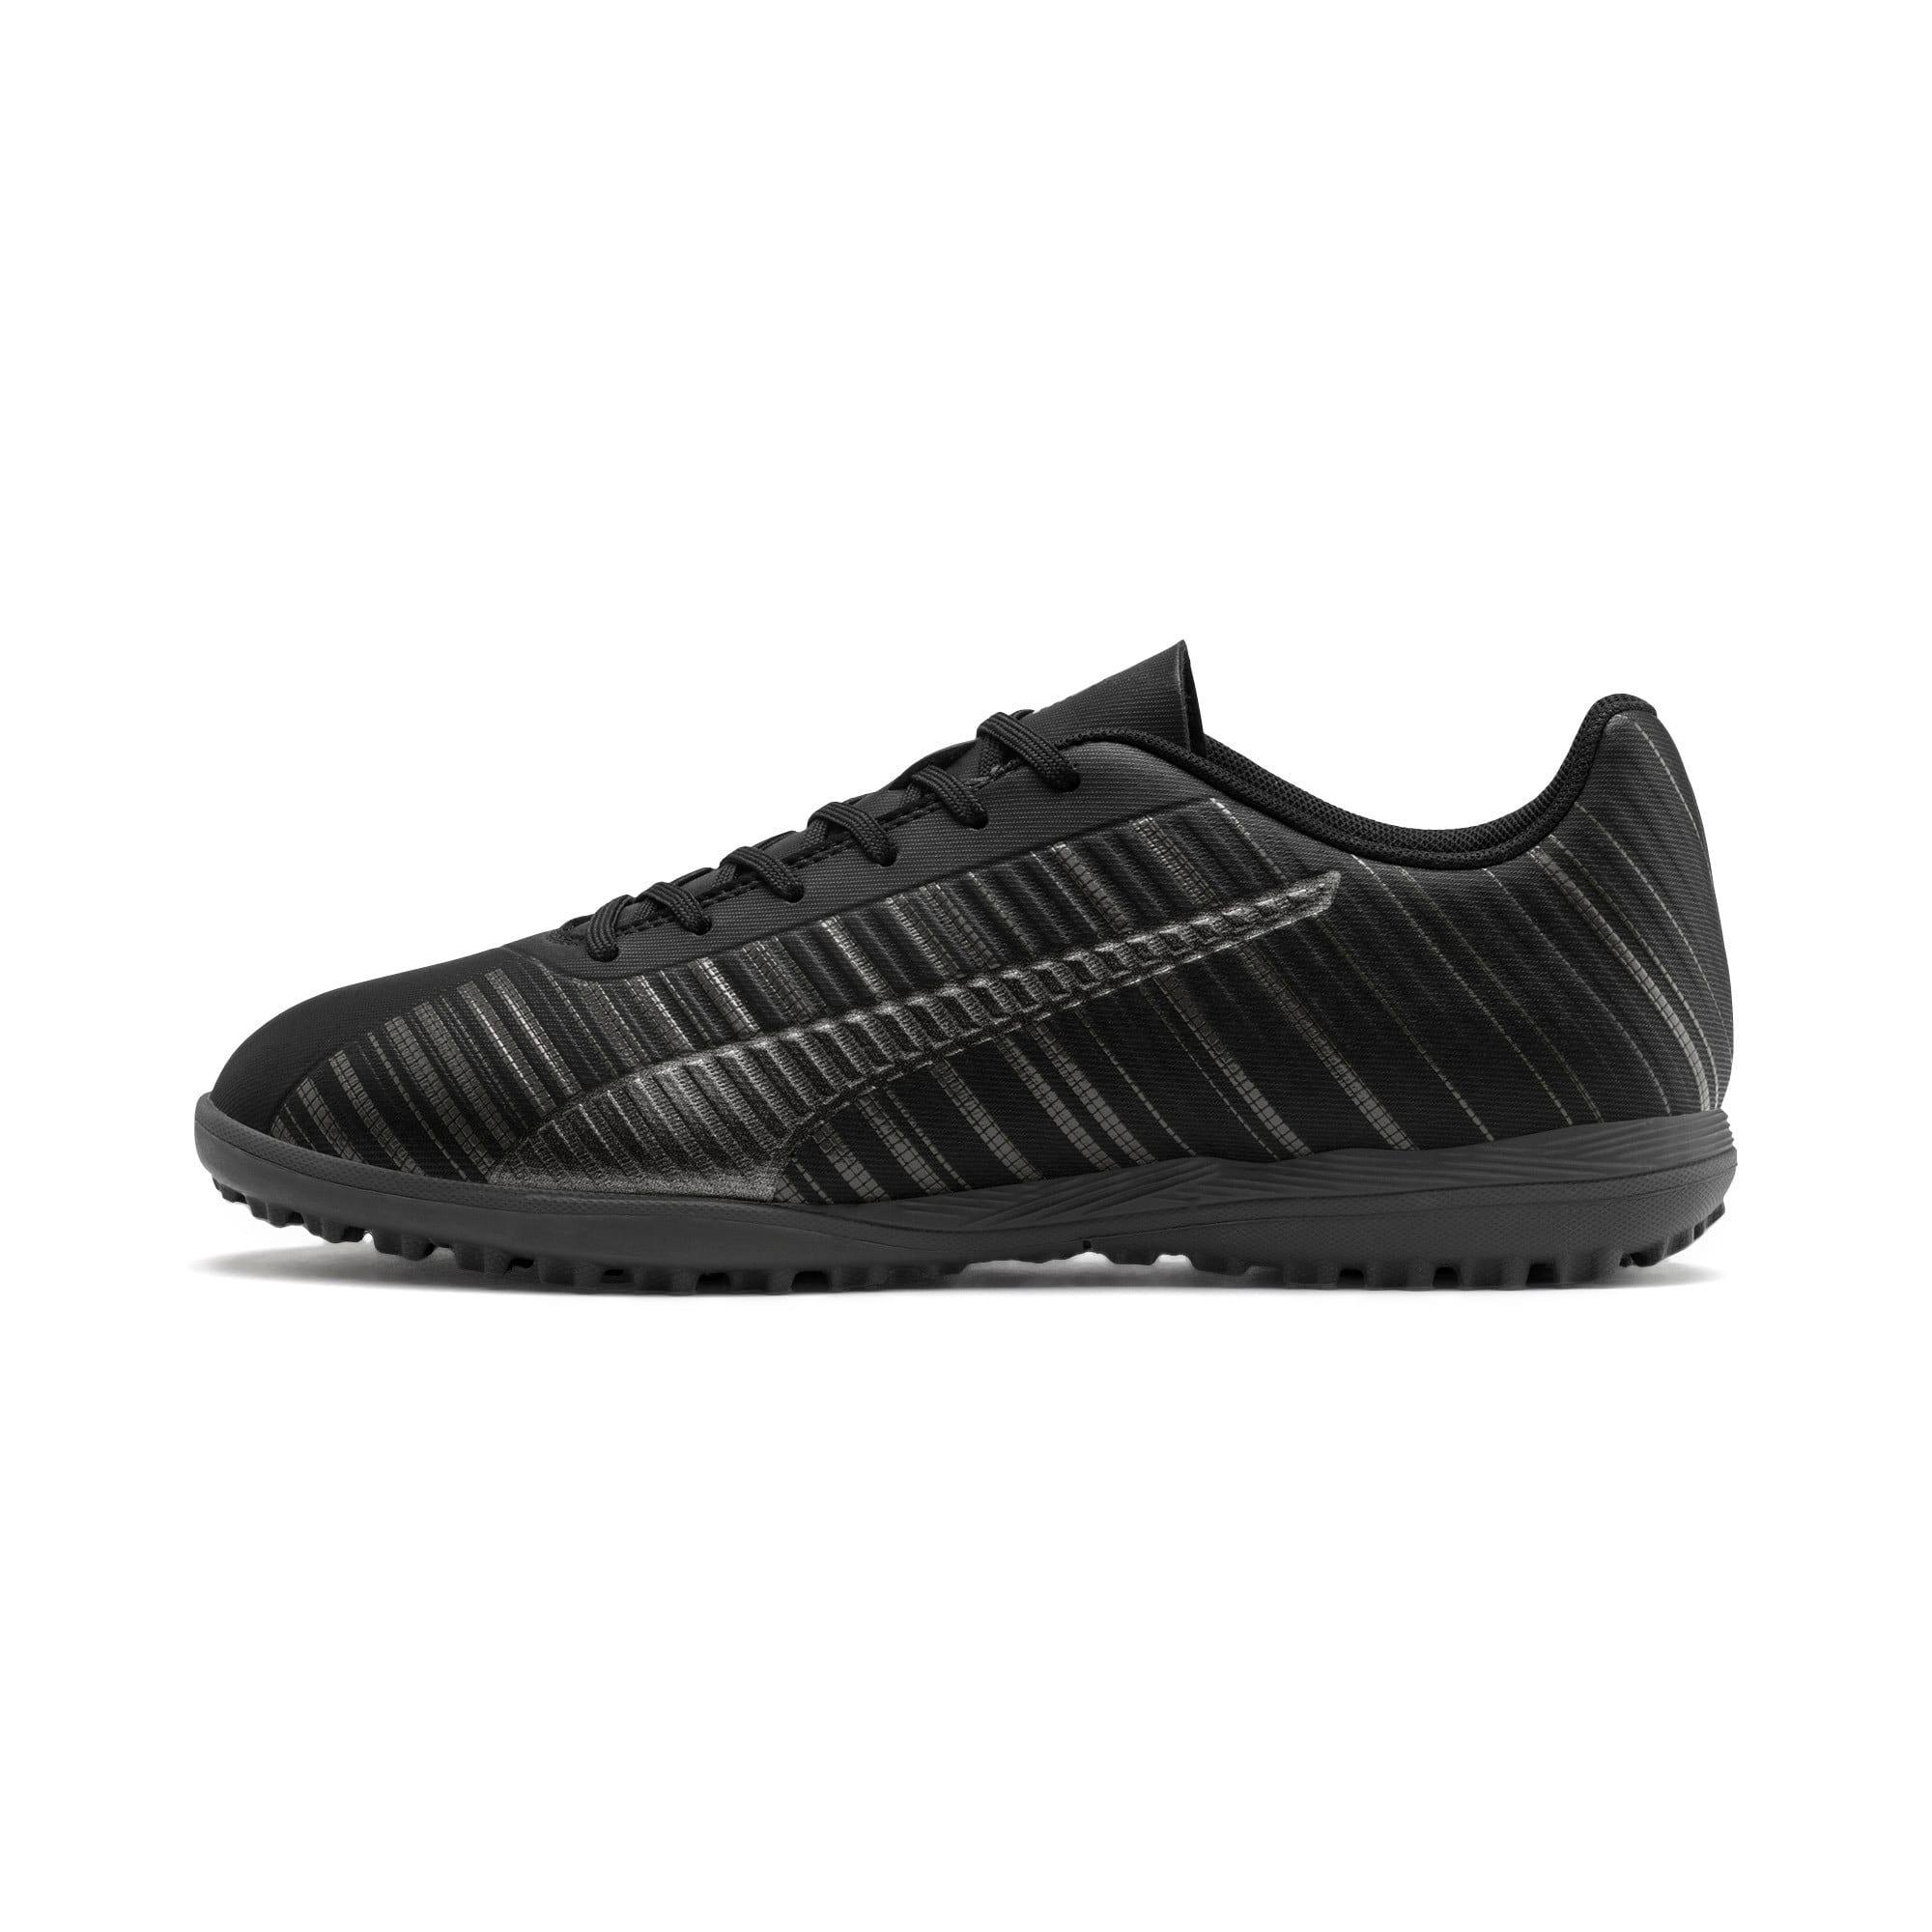 Thumbnail 1 of PUMA ONE 5.4 TT Men's Football Boots, Black-Black-Puma Aged Silver, medium